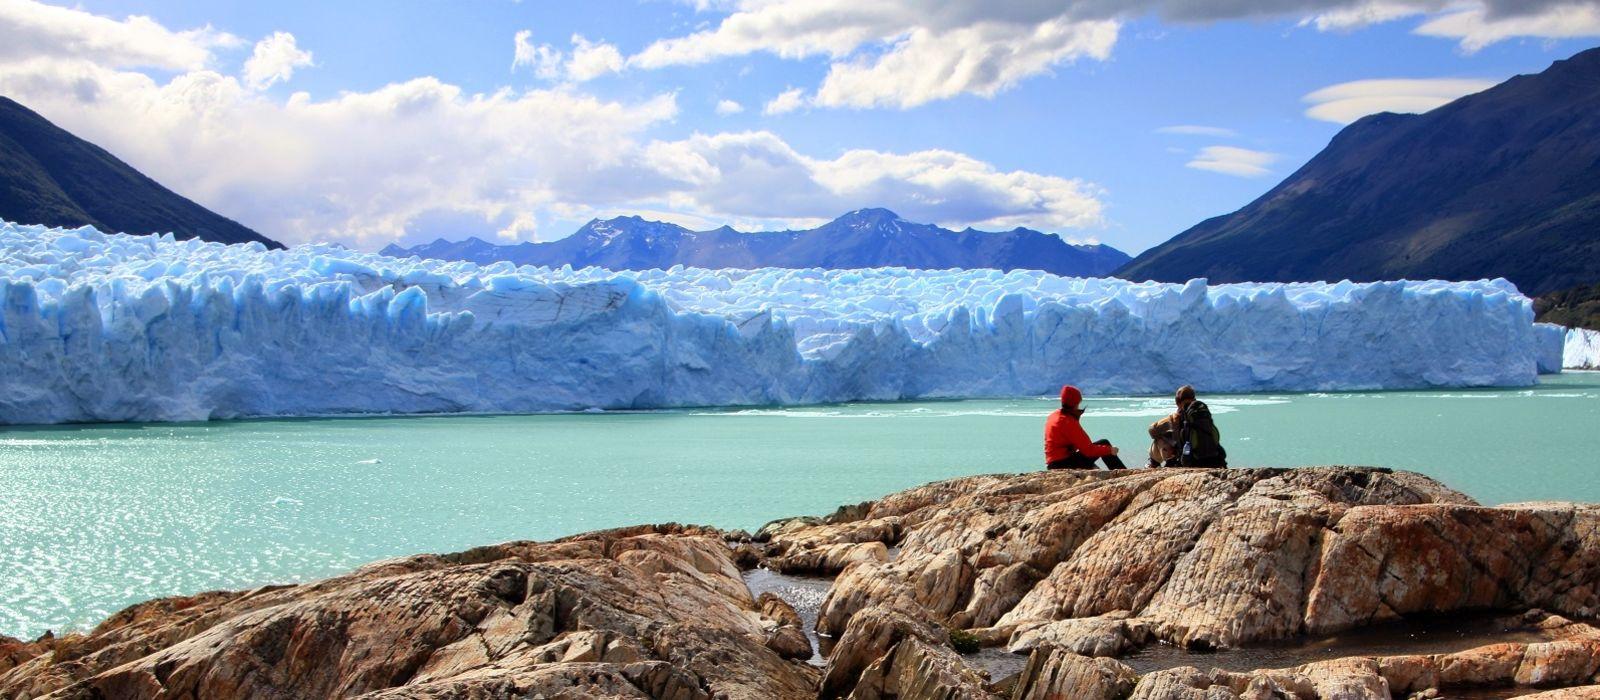 Argentina: Signature Highlights Tour Trip 2